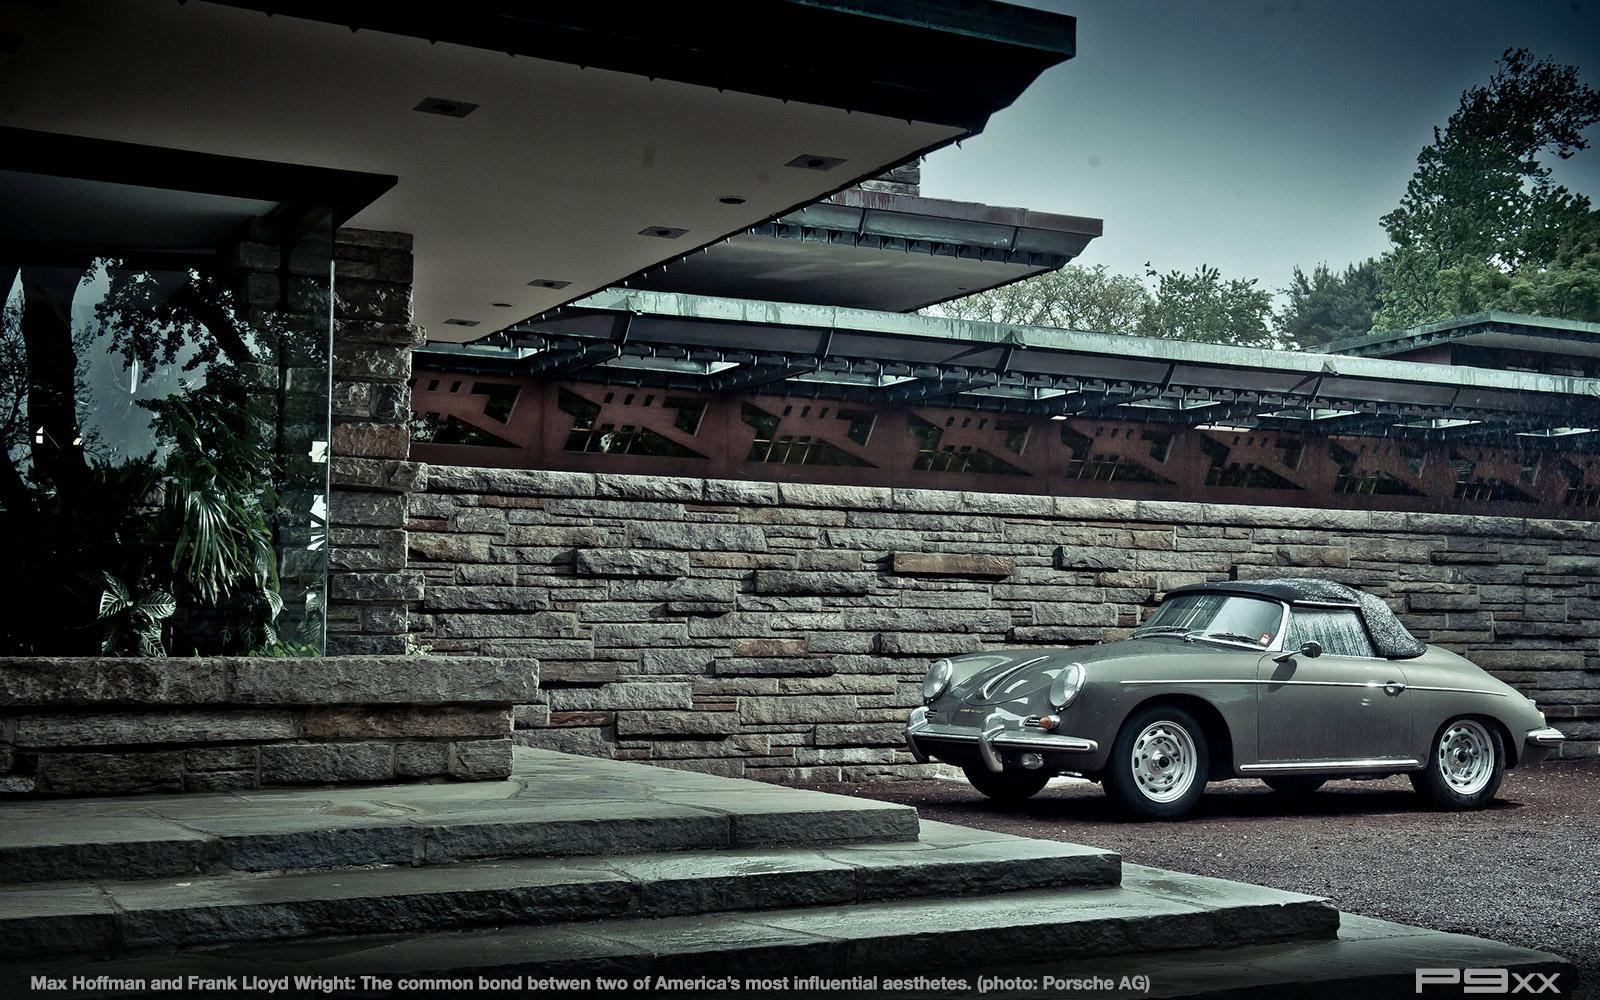 Max-Hoffman-Frank-Lloyd-Wright-Porsche-356-323